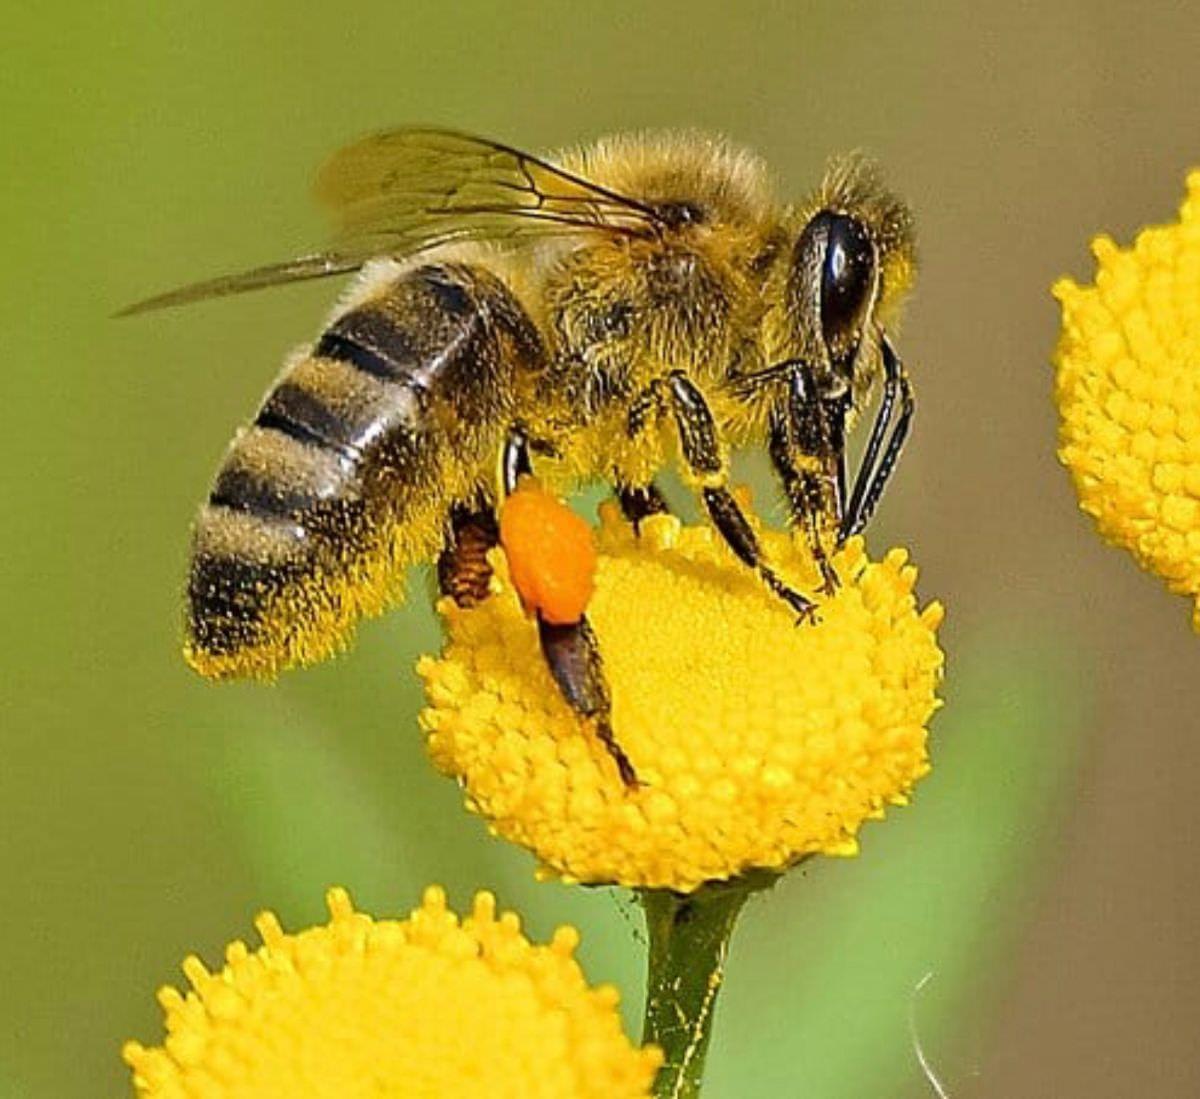 Honey Bees with Pollen